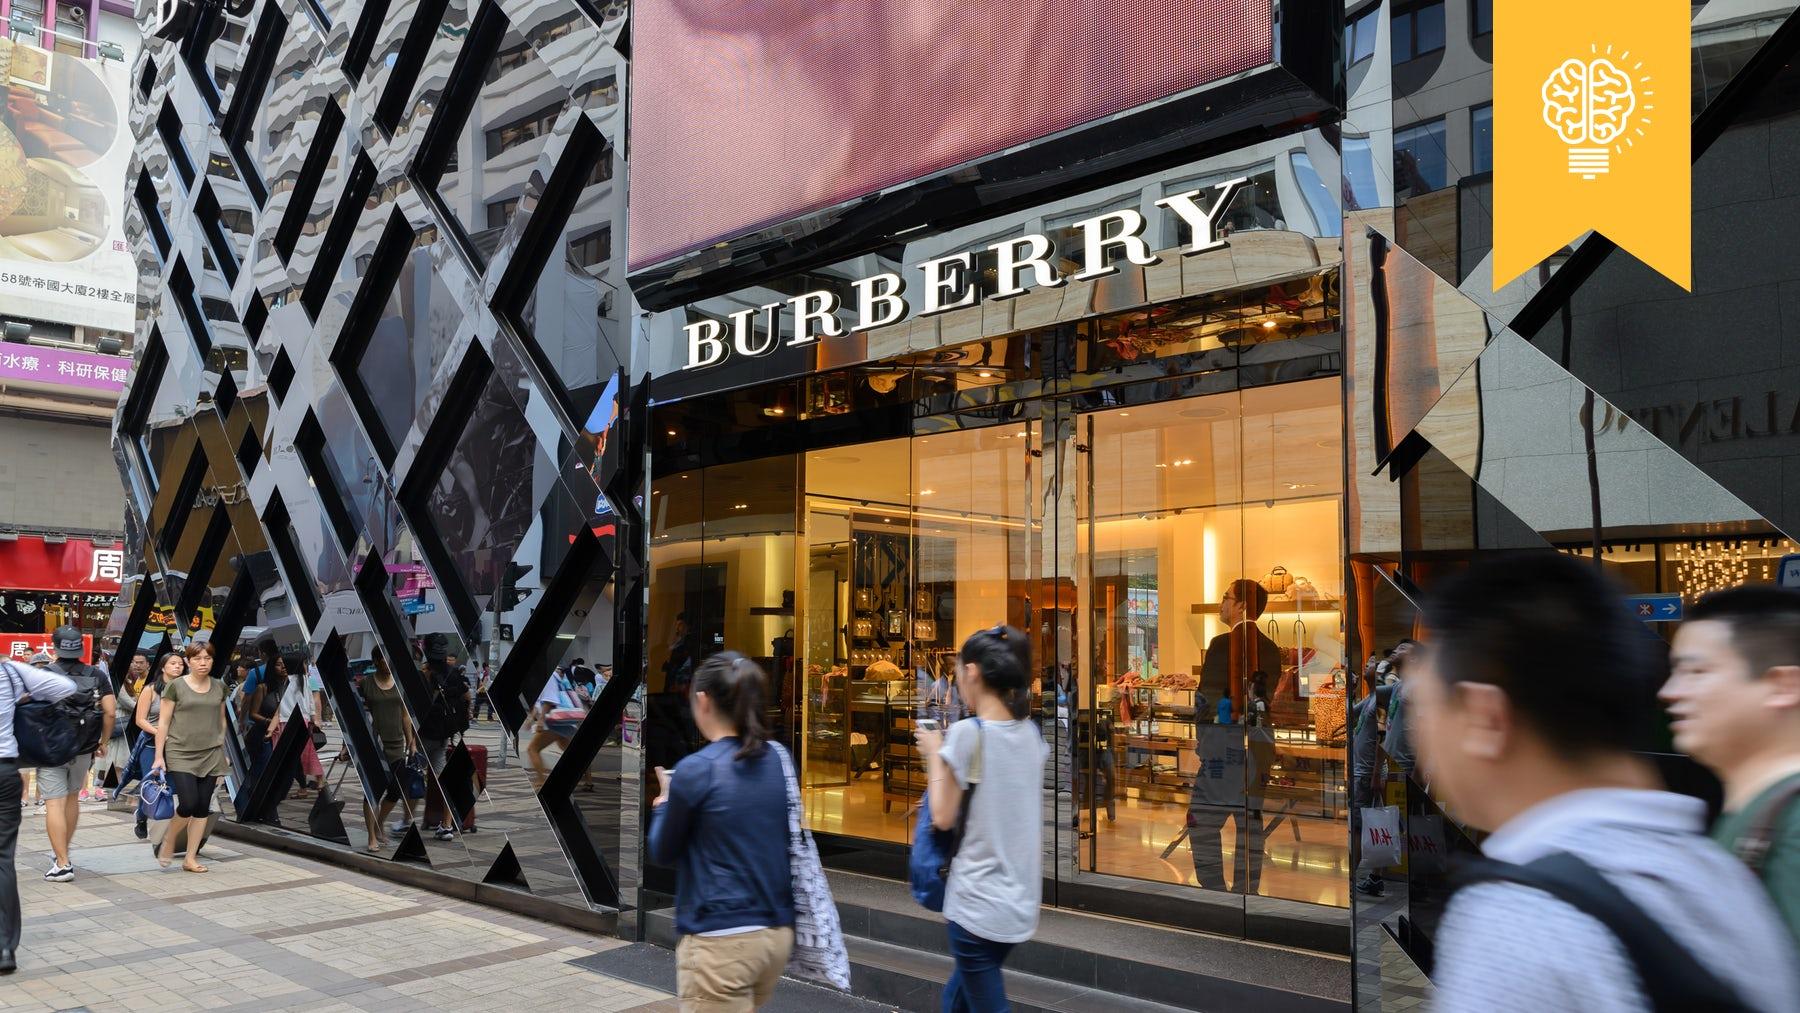 Burberry store in Hong Kong | Source: Shutterstock